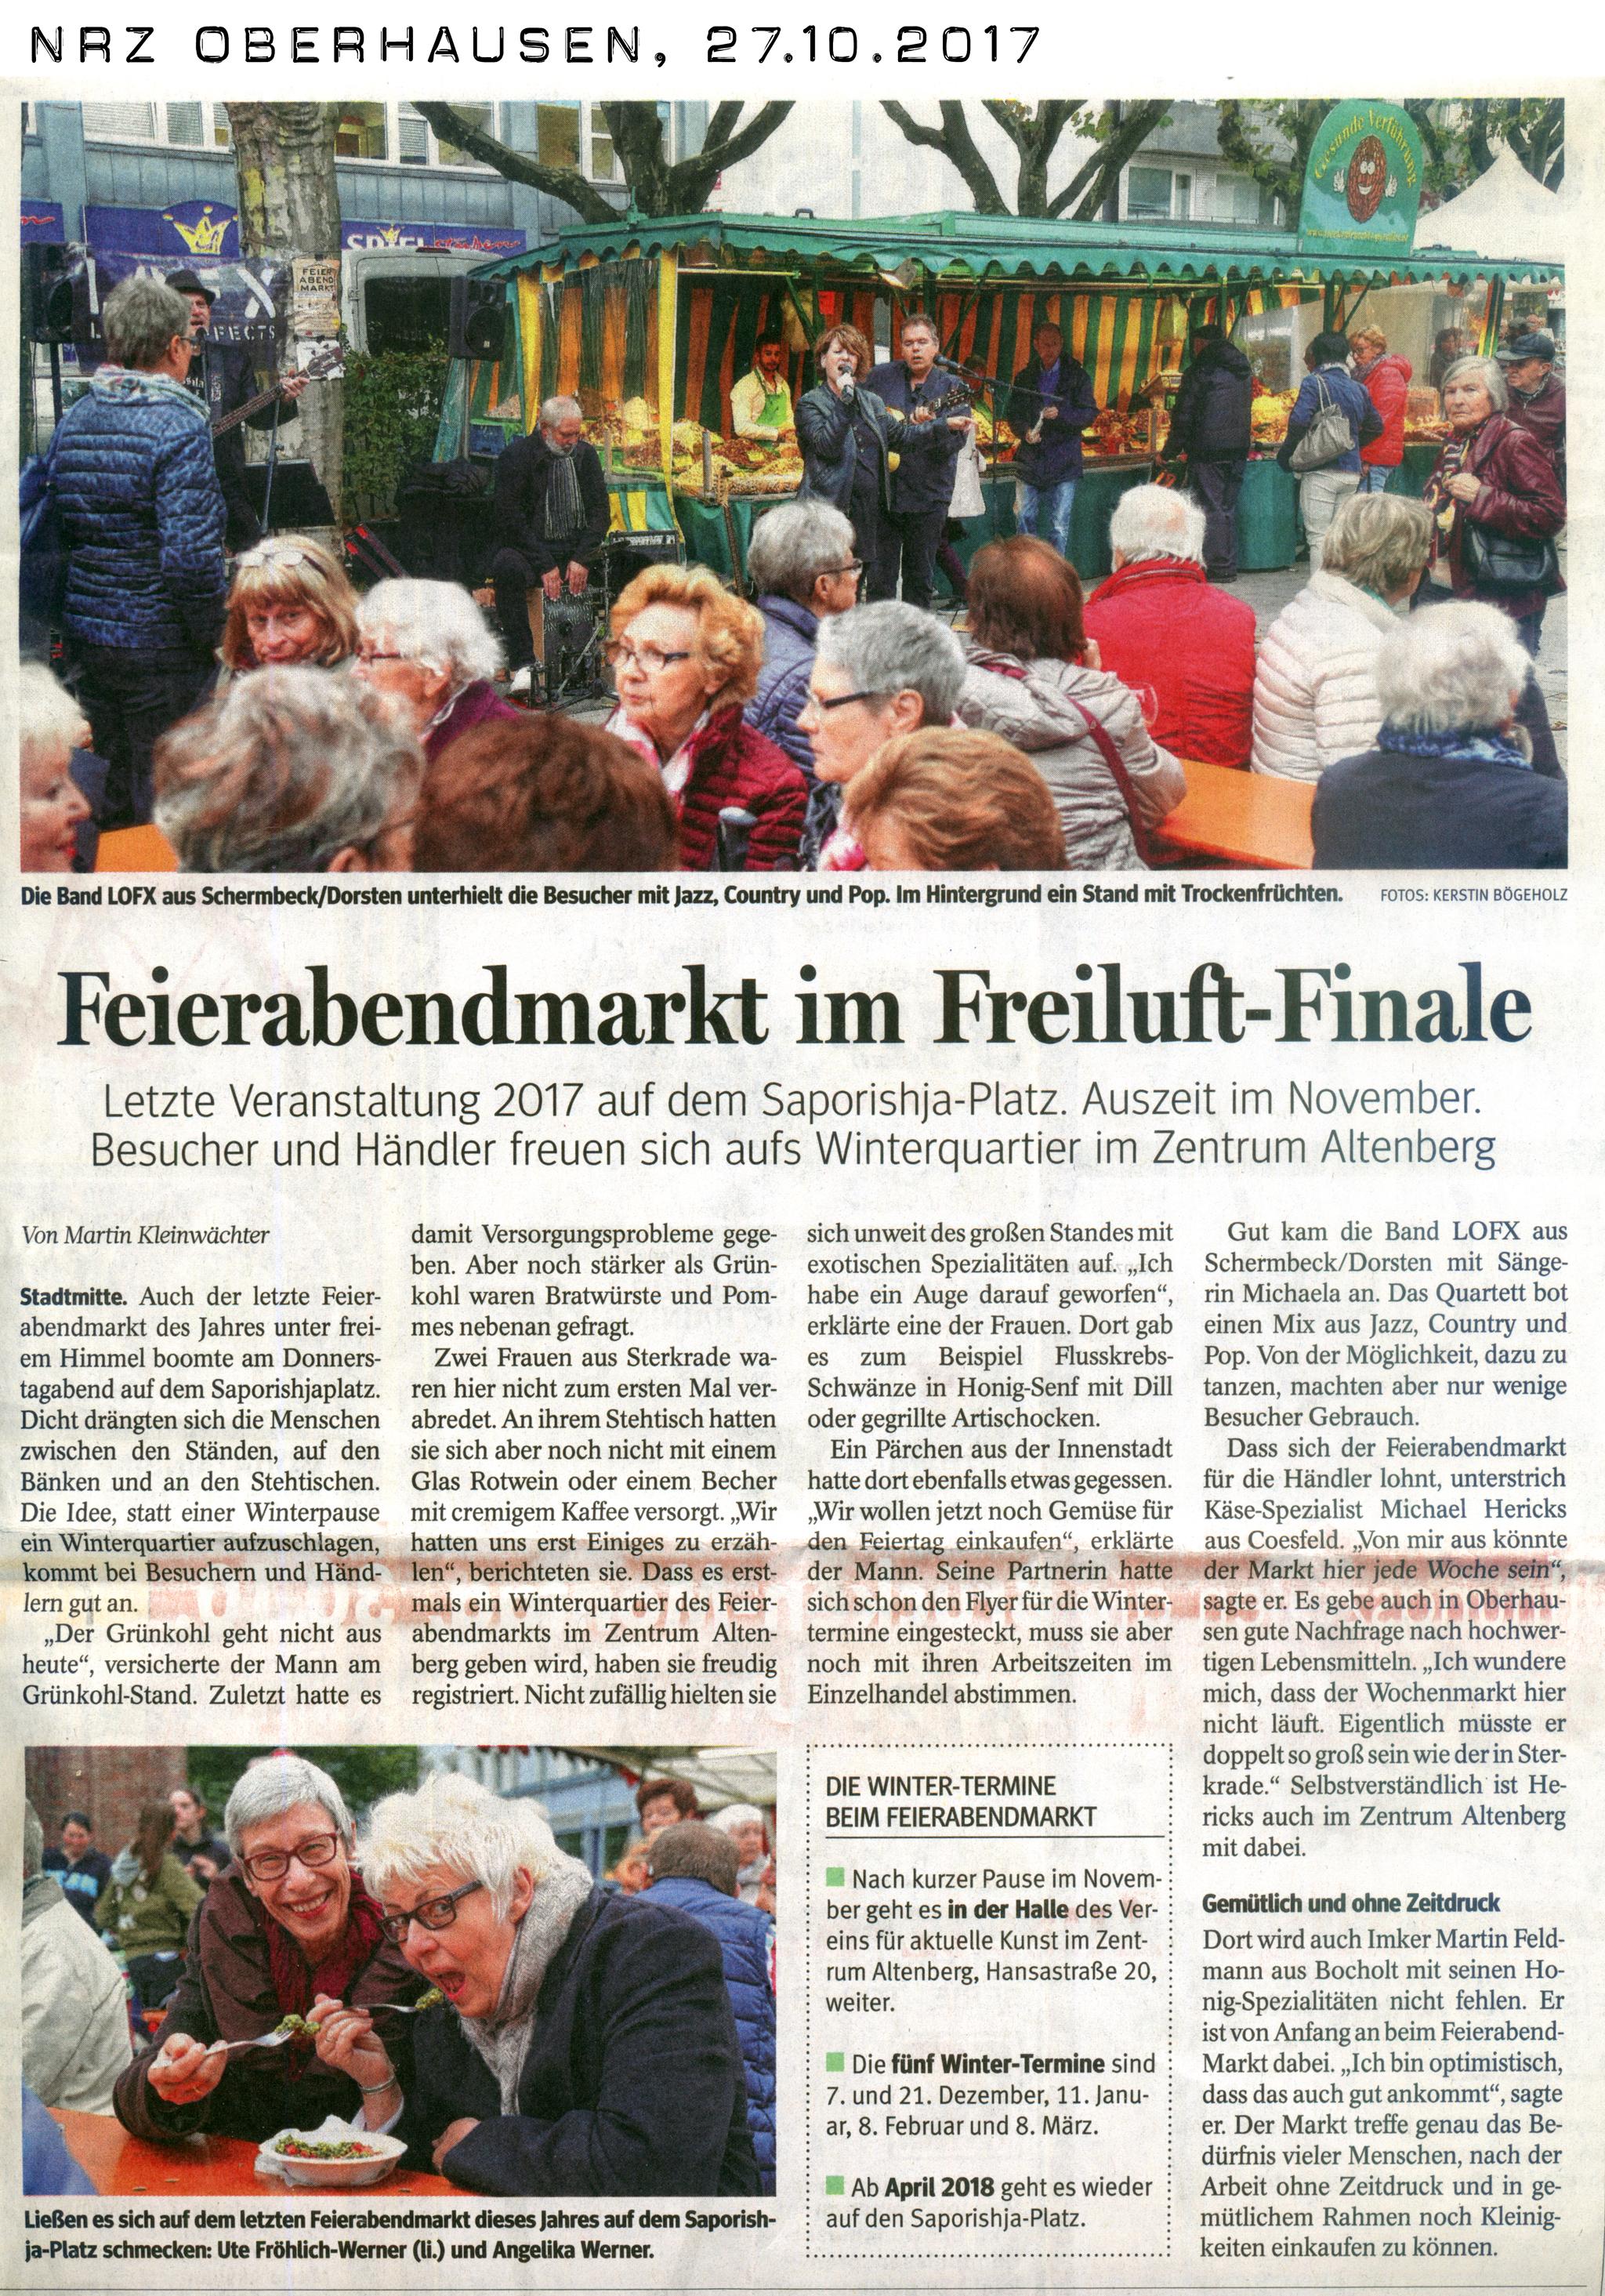 NRZ Oberhausen, 27.10.2017